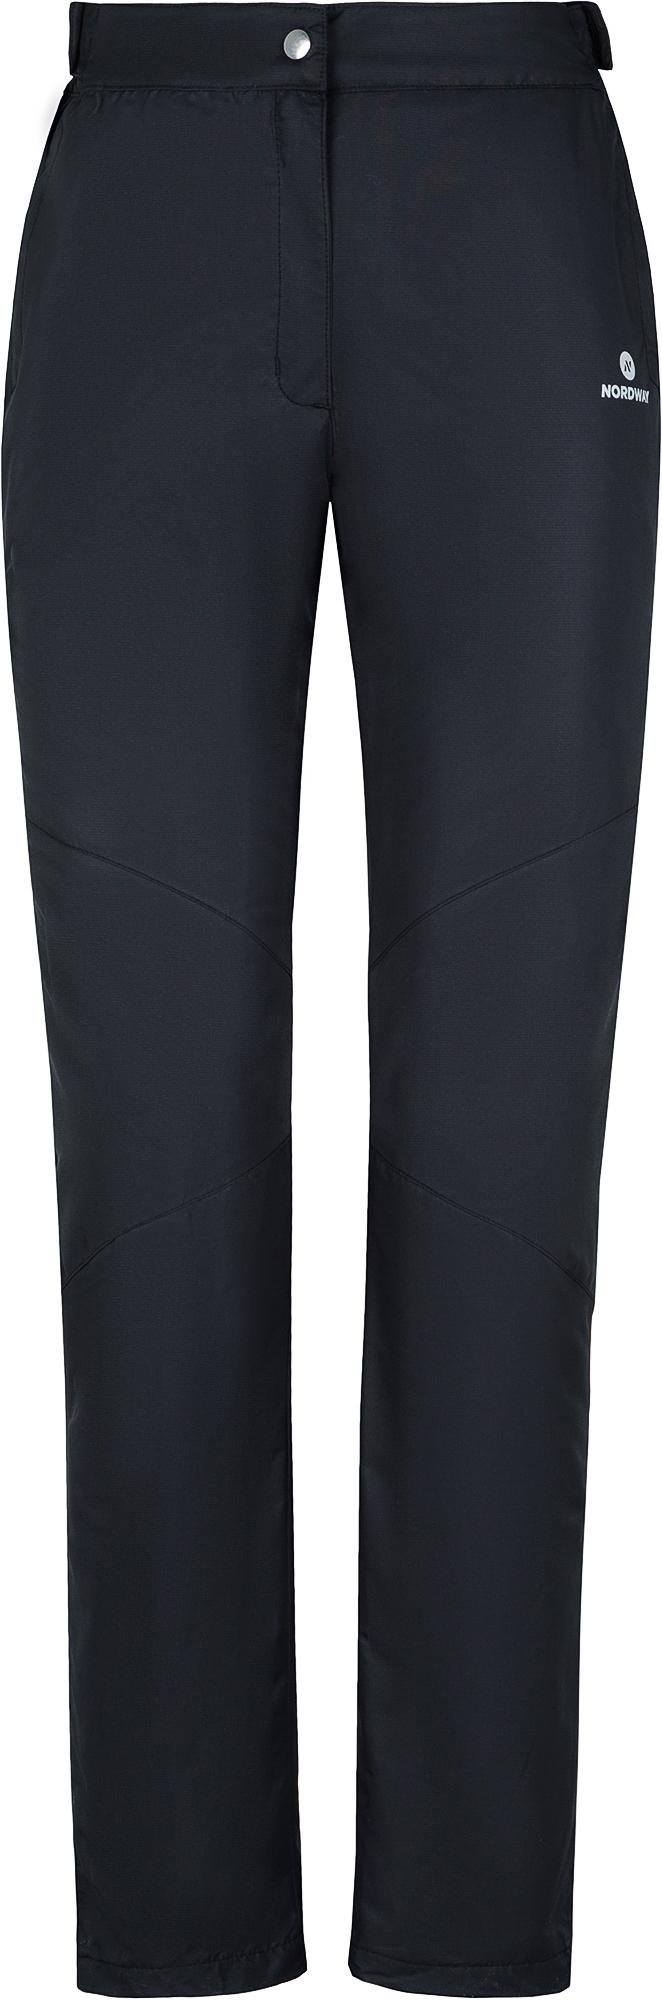 Nordway Брюки утепленные женские Nordway, размер 42 nordway куртка утепленная мужская nordway размер 46